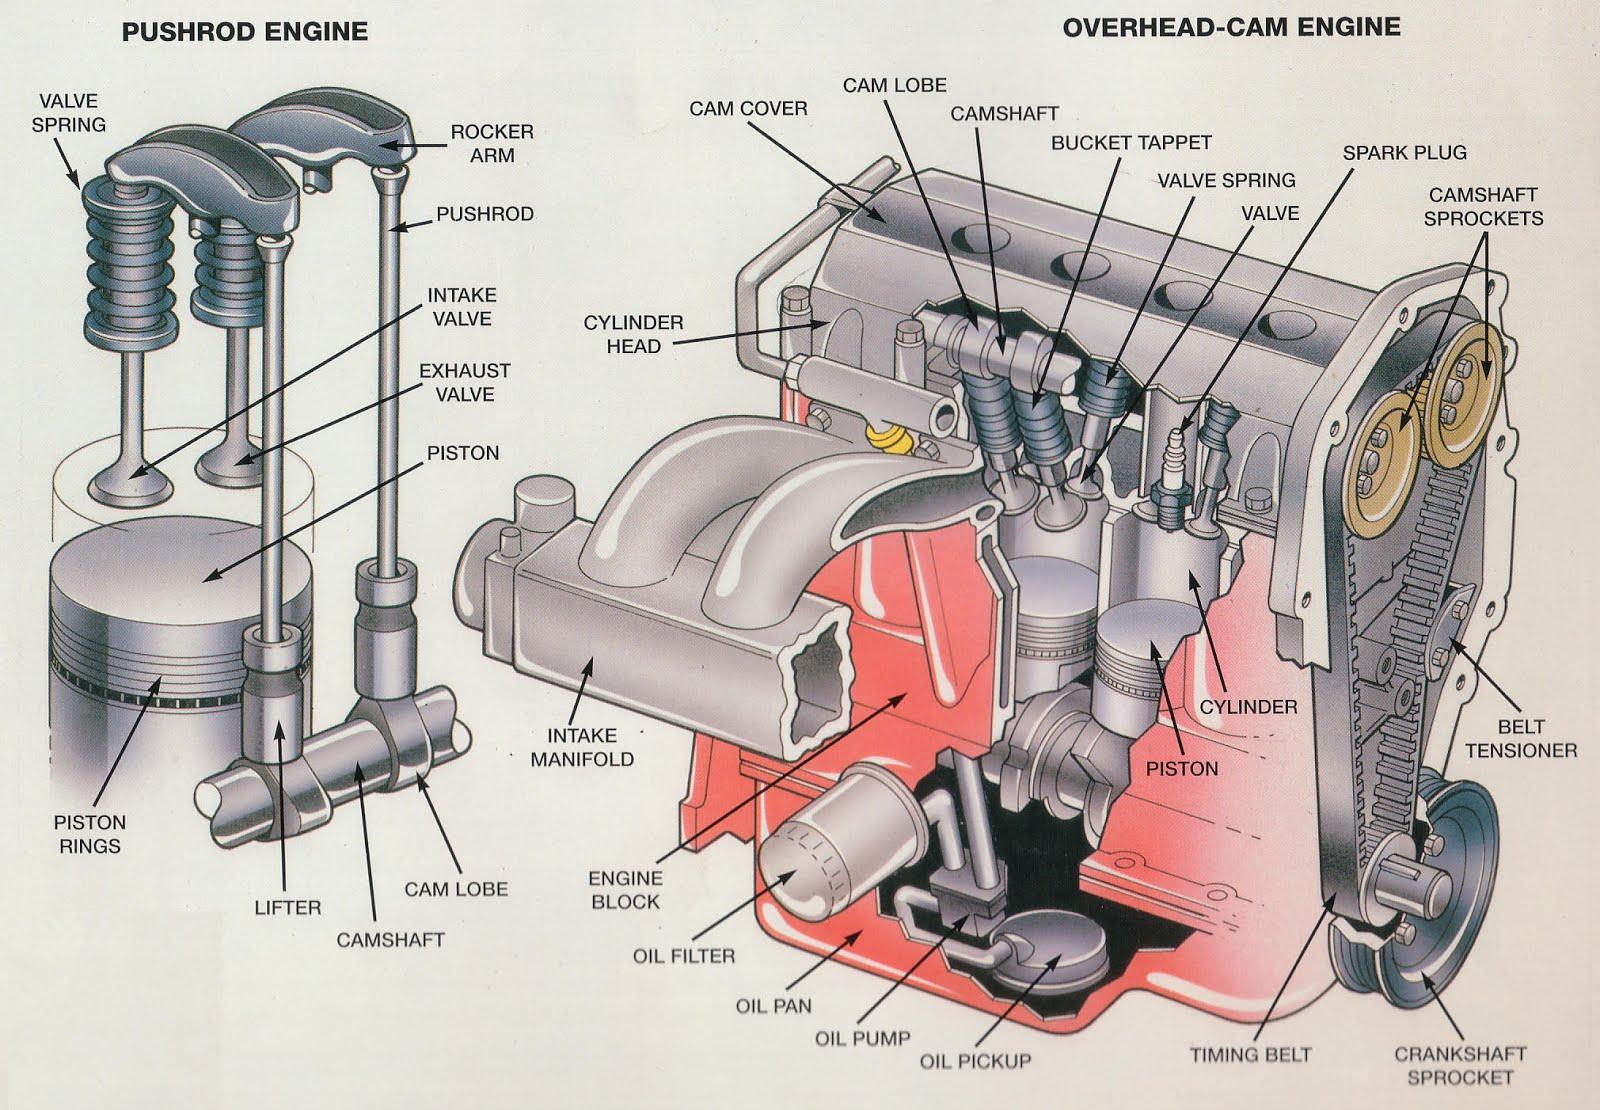 small resolution of single overhead cam engine diagram cylinder piston engine flathead motor overhead valve engine diagram